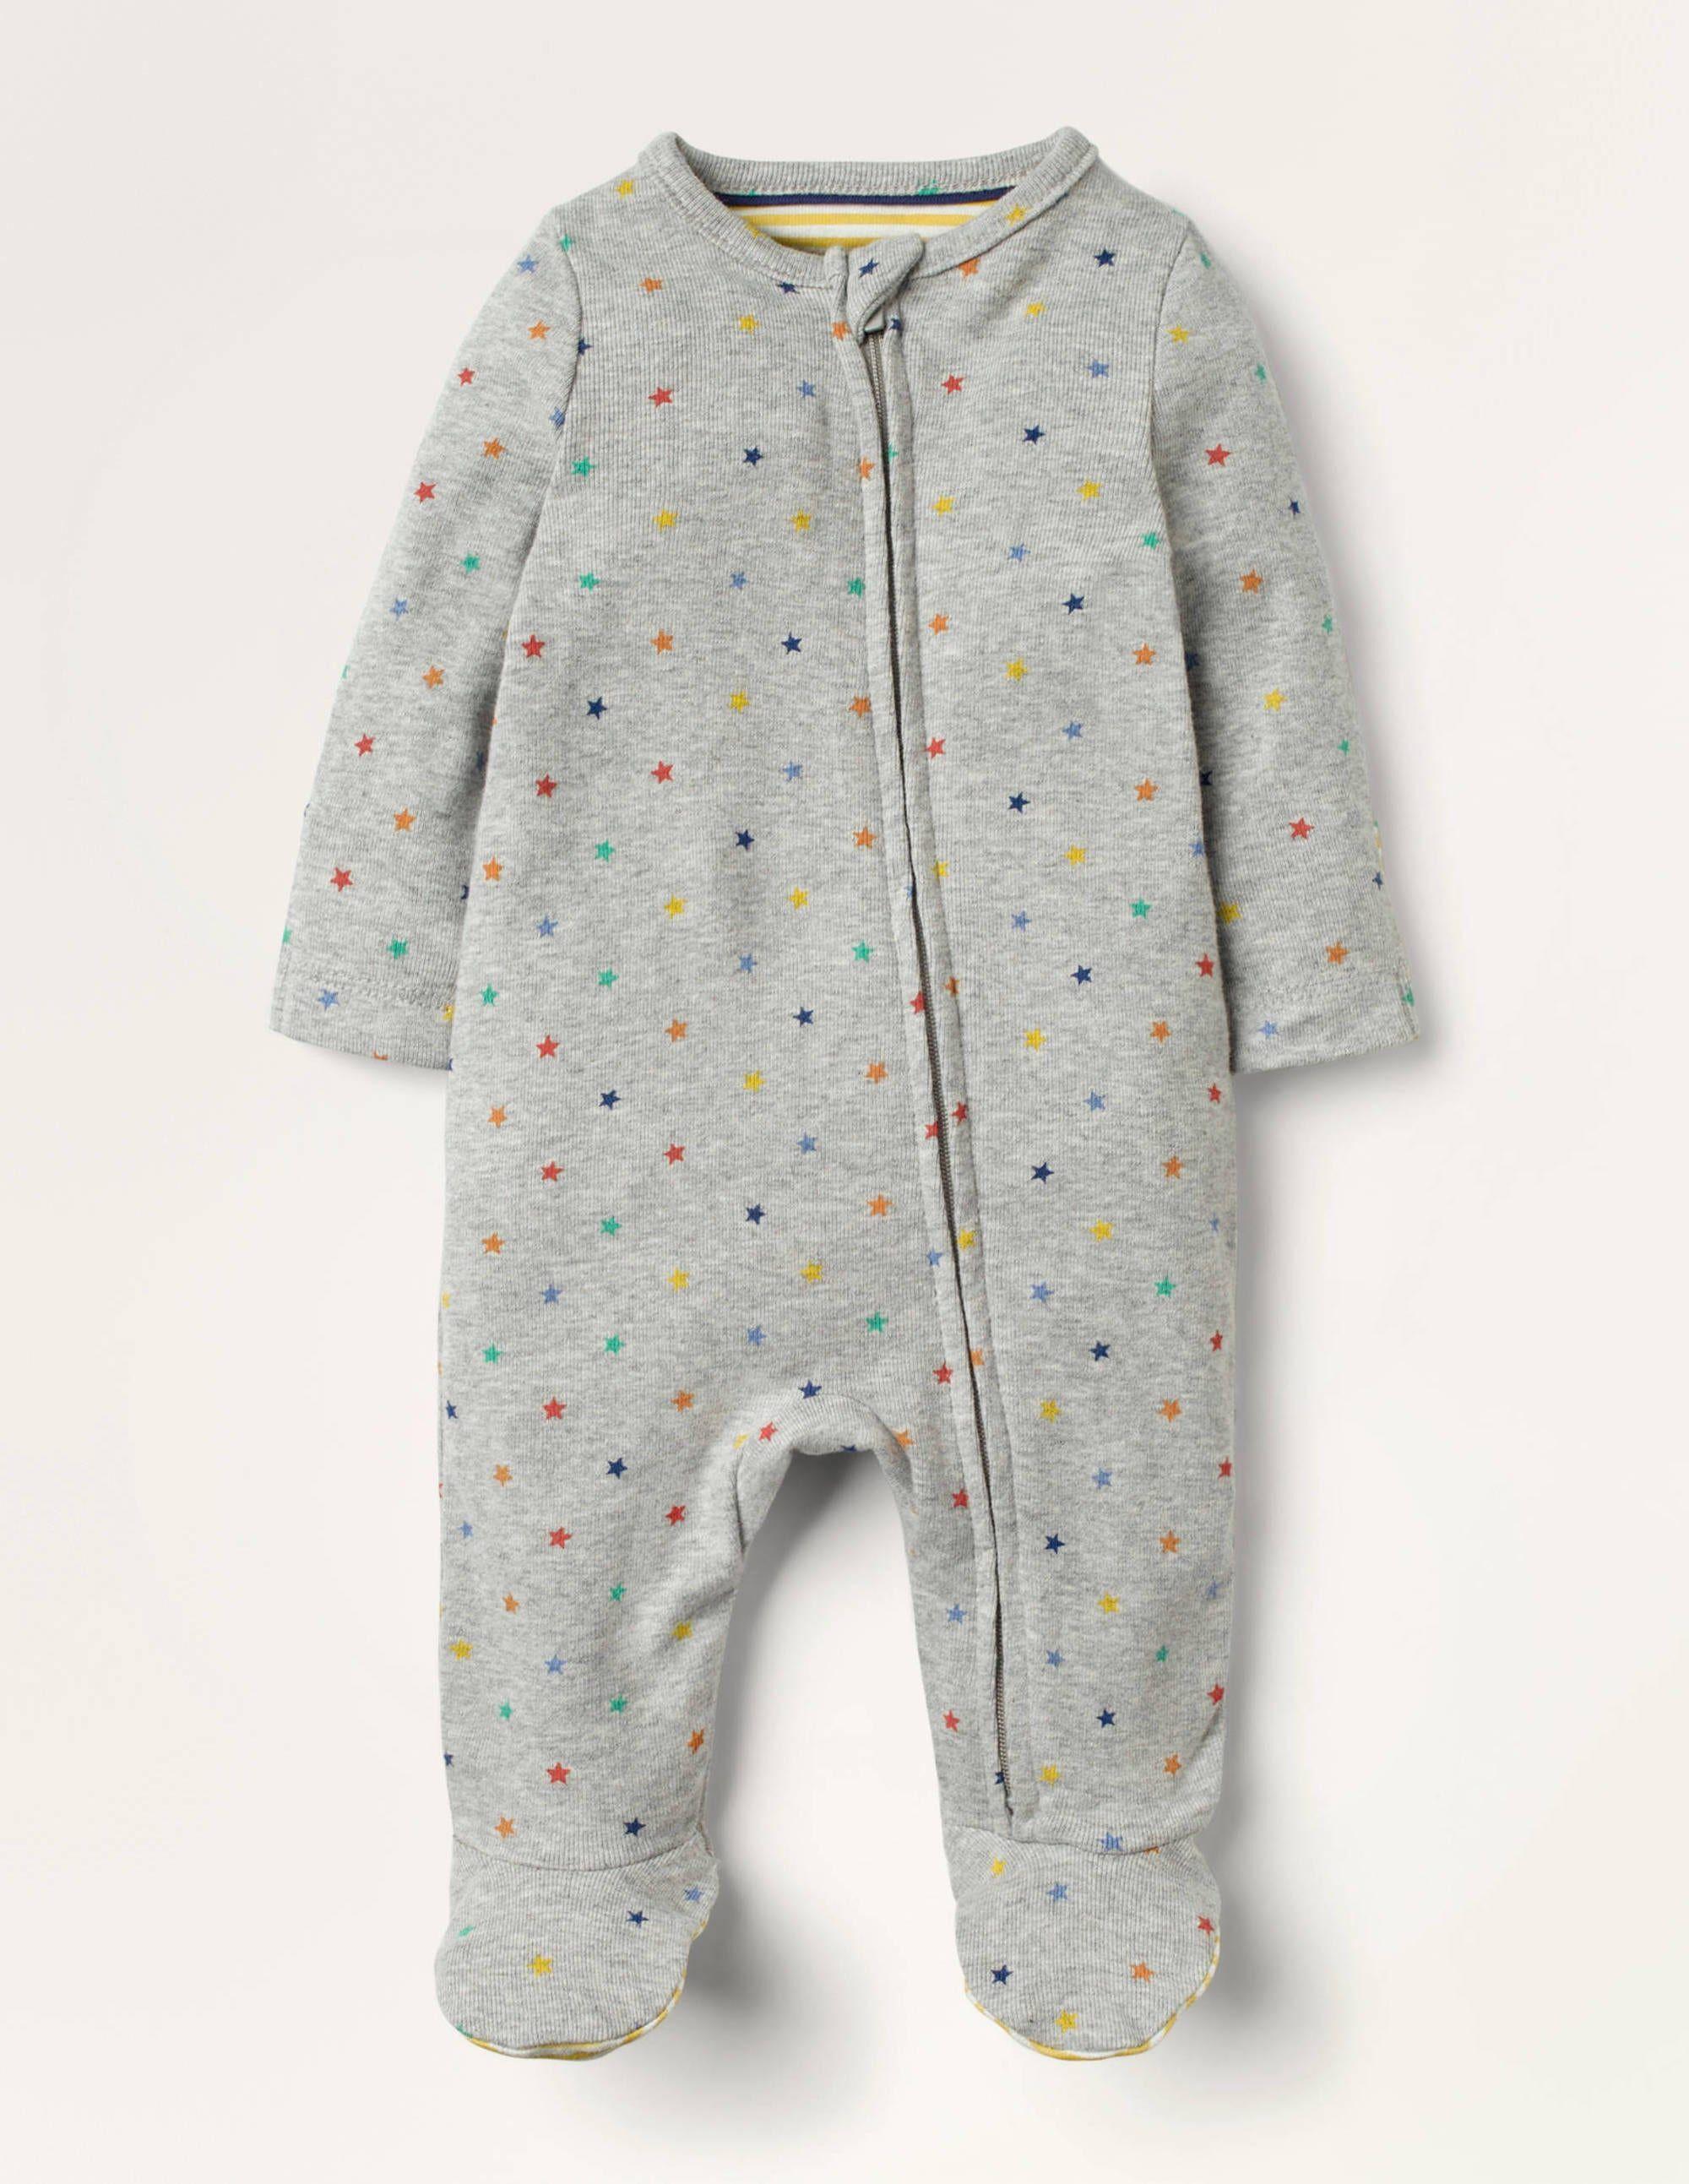 Baby Grenouillère zippée ultra-douce à motif étoile GRY Bébé Boden, Grey - 12-18m